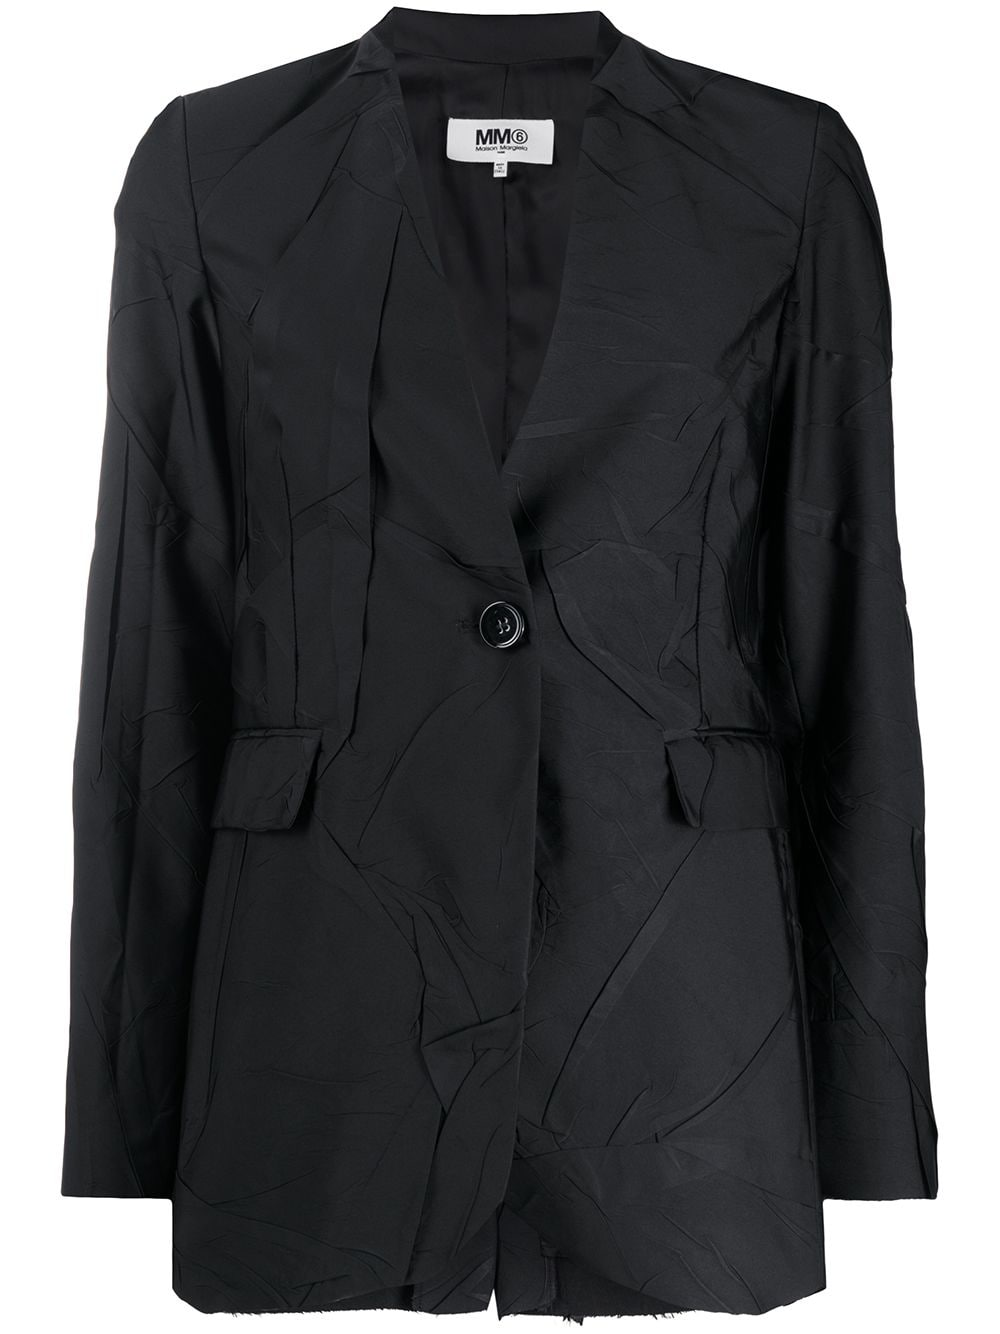 Taffeta Jacket